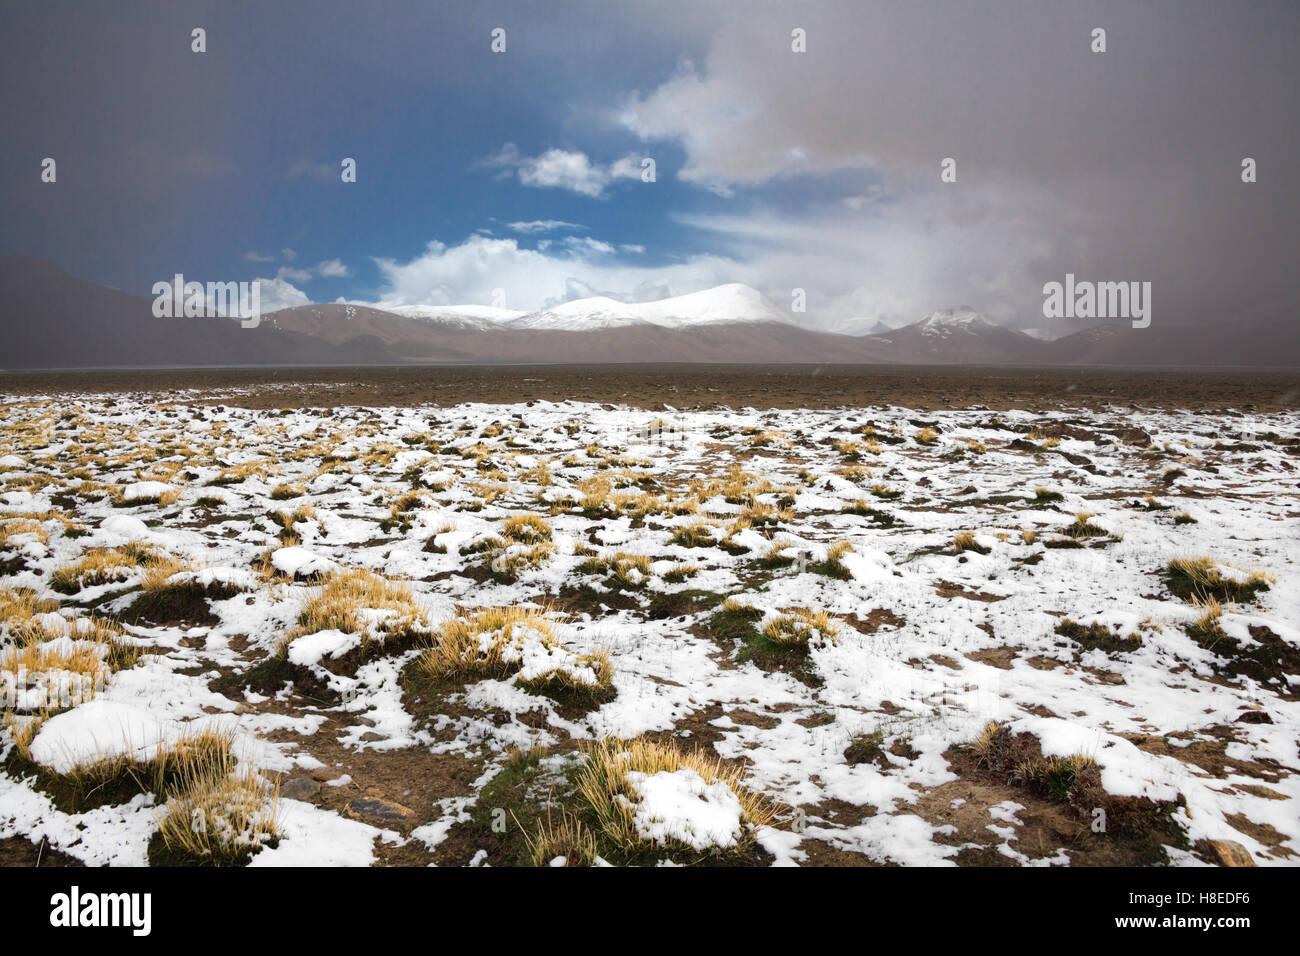 Paysage près du lac Karakul - Pamir - T ajikistan - GBAO province - le toit du monde Photo Stock